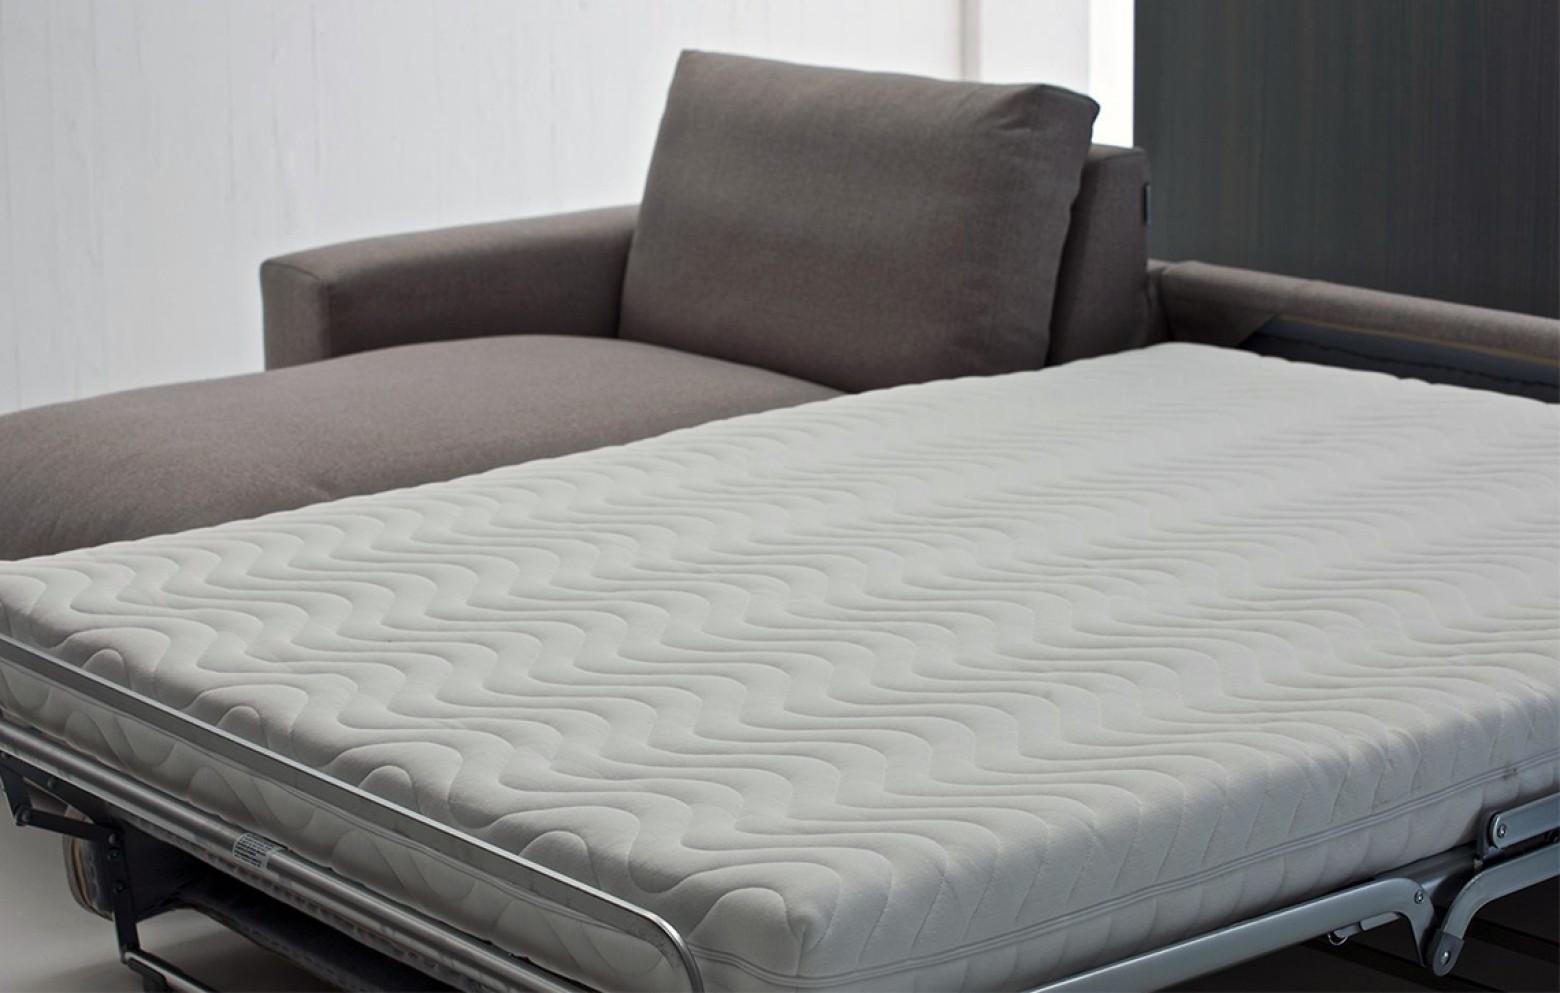 togo ecksofa bettsofas betten schr nke who 39 s perfect. Black Bedroom Furniture Sets. Home Design Ideas